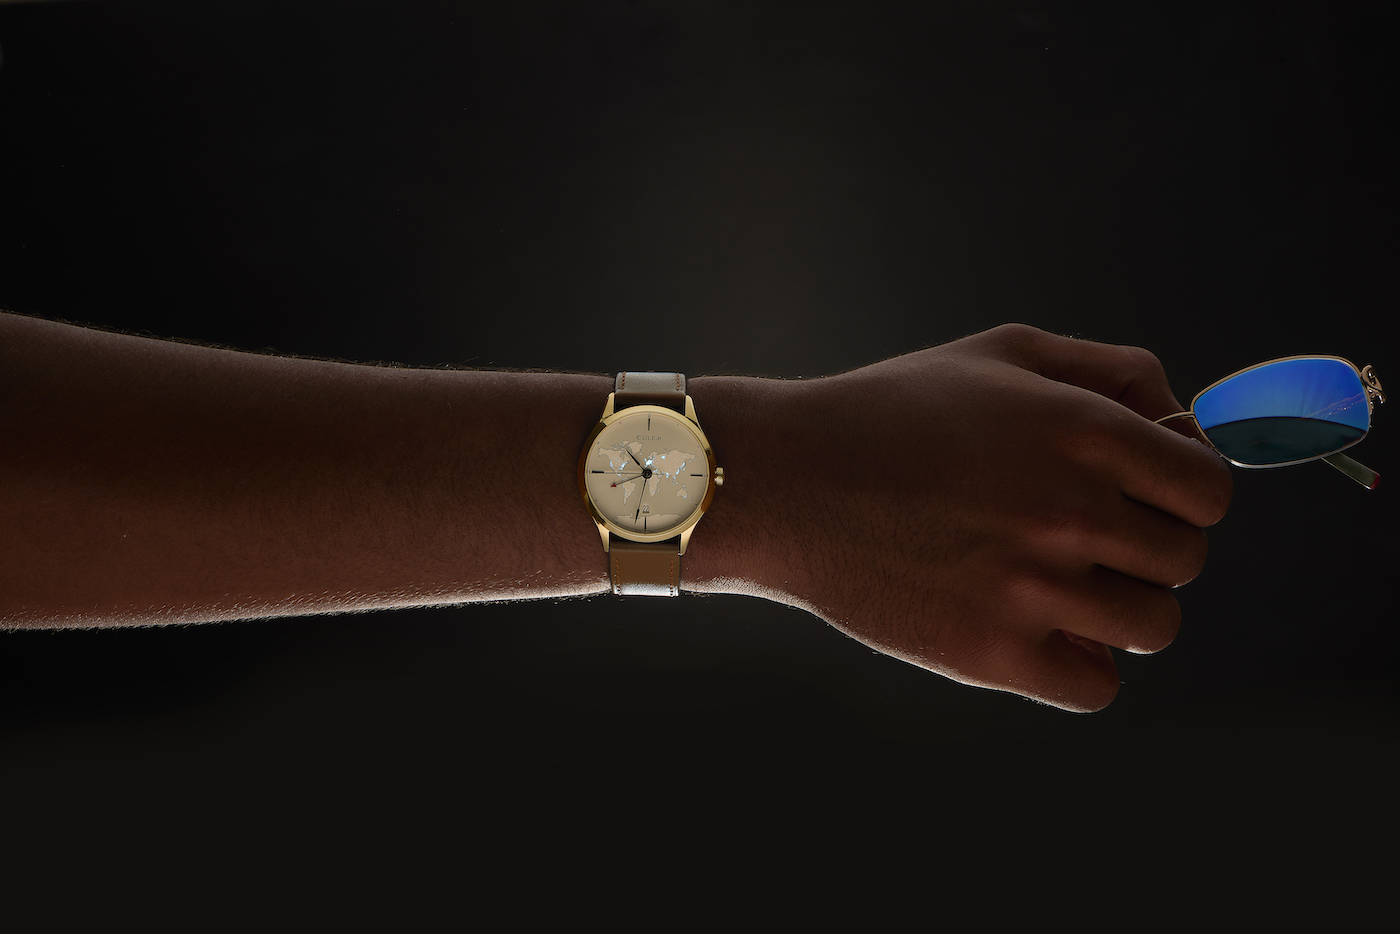 CuleM Lights GMT watch